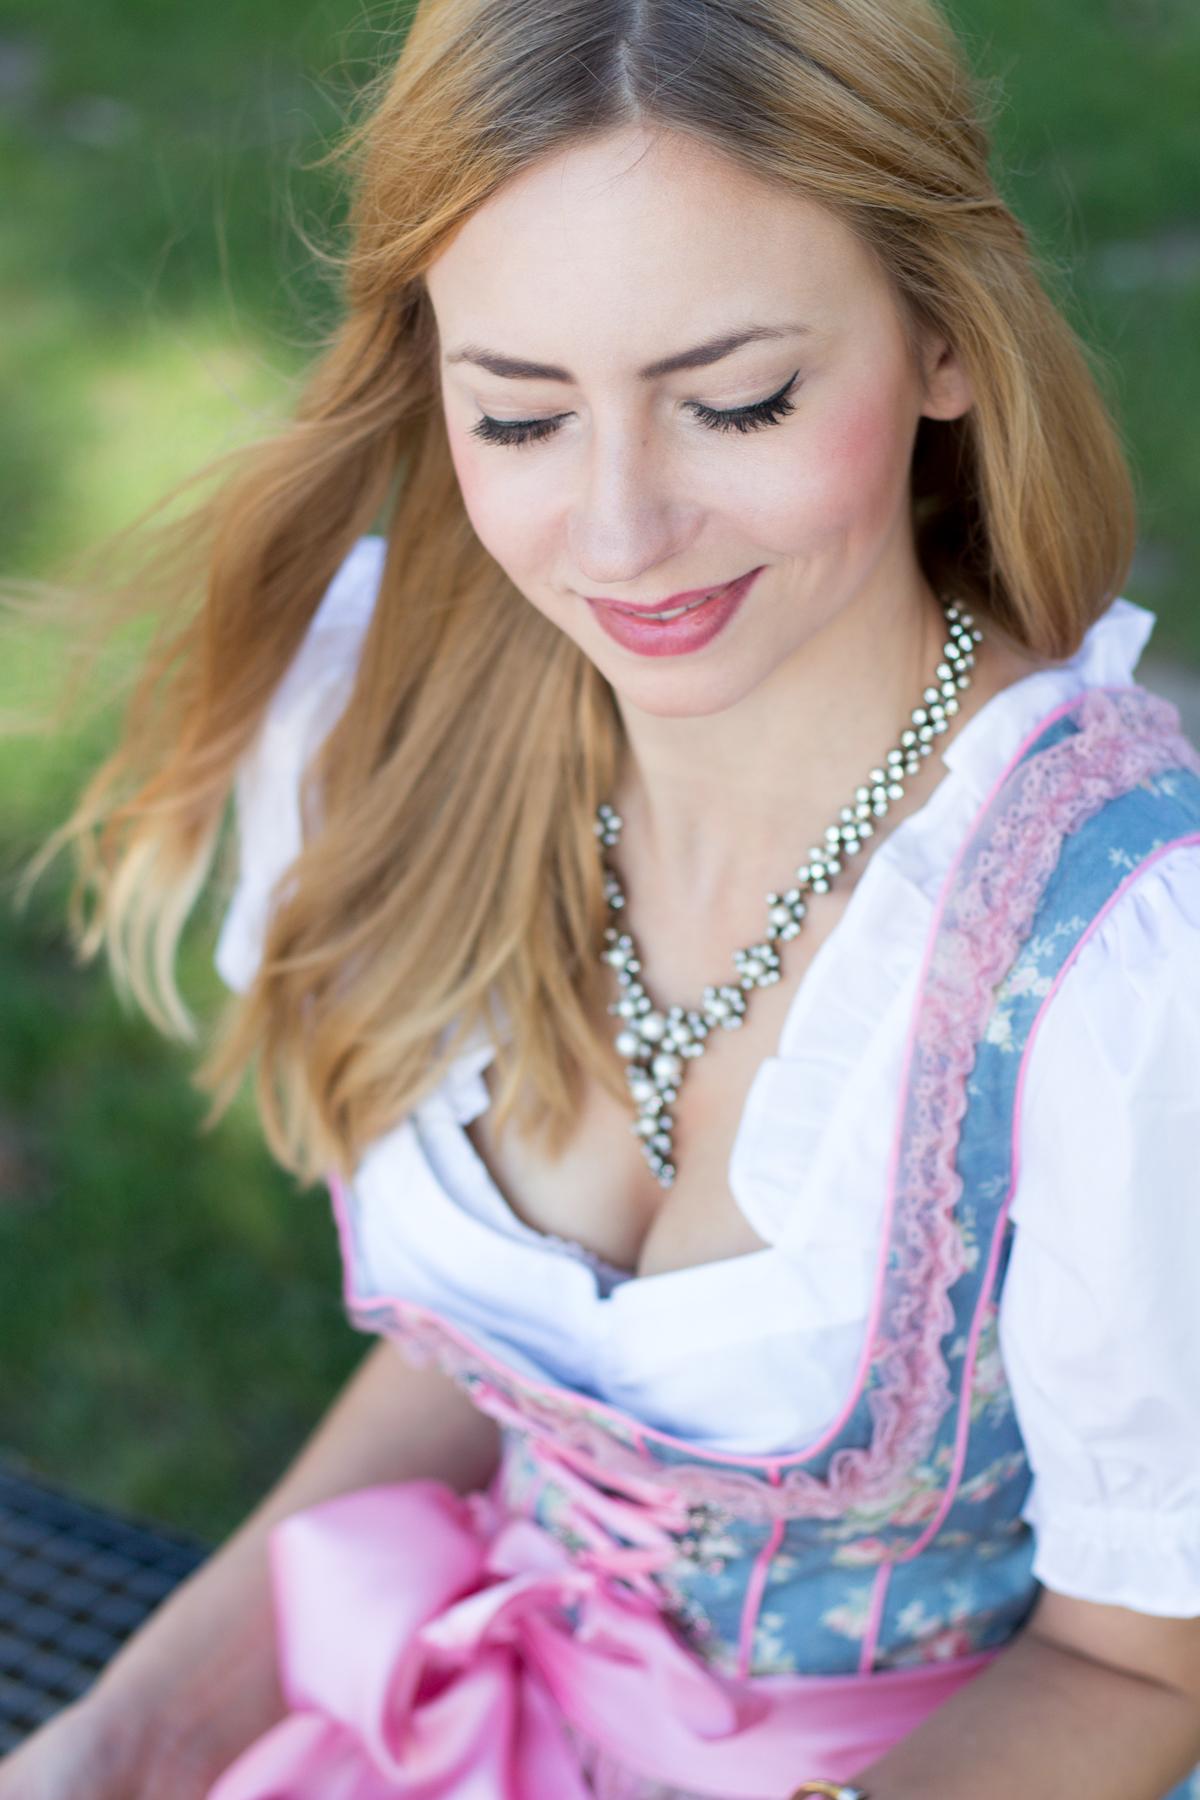 Dirndl Trend & Oktoberfest 2015 Facts II How I met my outfit by Dana Lohmüller